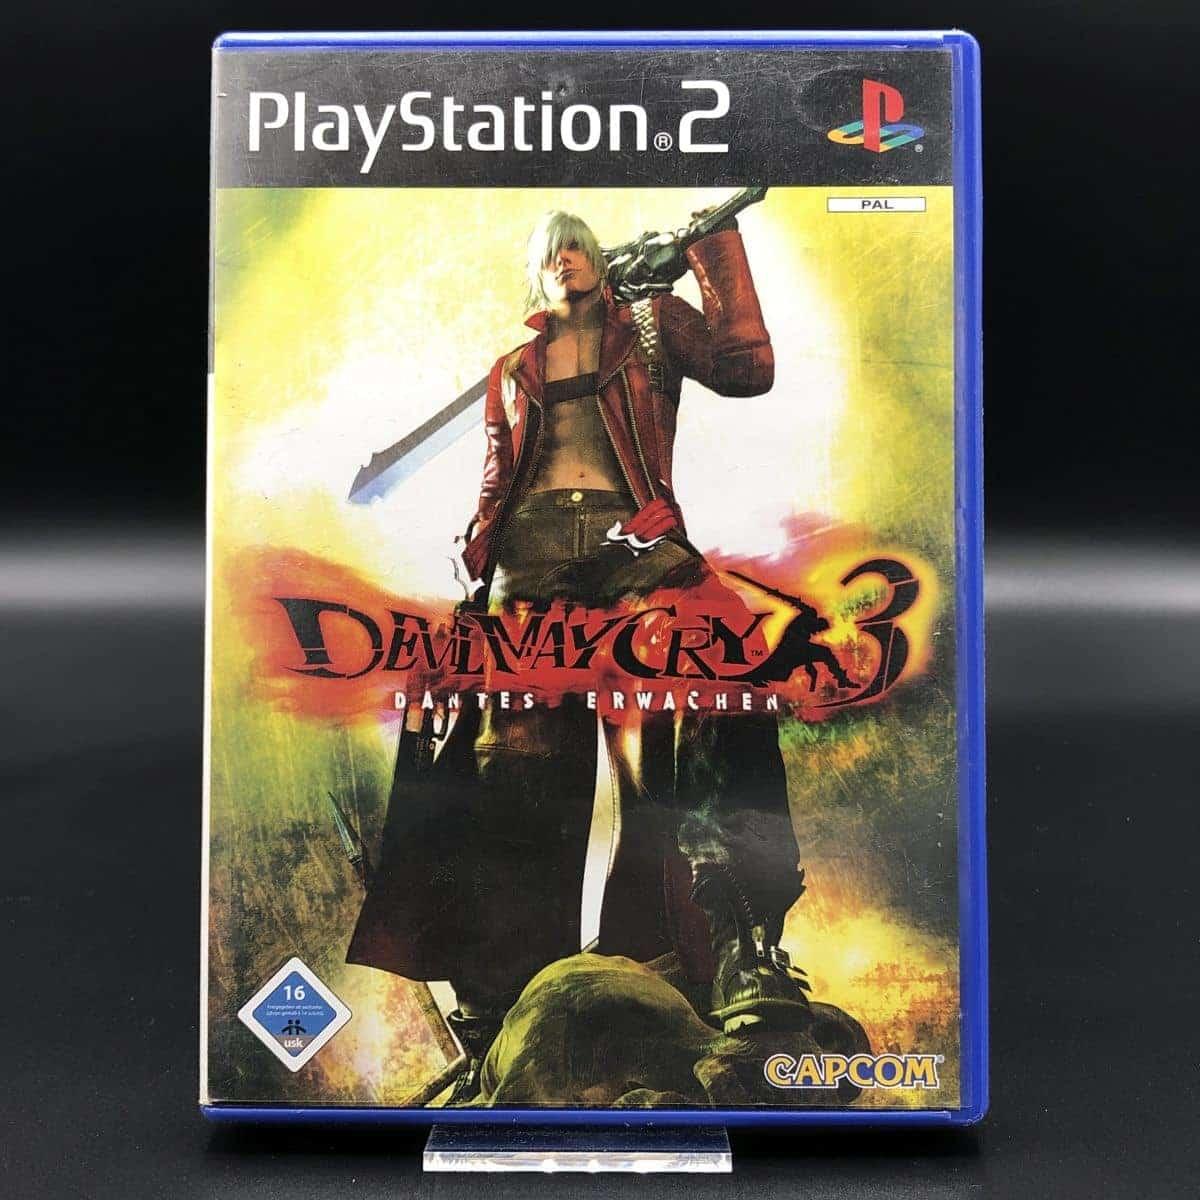 PS2 Devil May Cry 3: Dante's Erwachen (Komplett) (Gut) Sony PlayStation 2